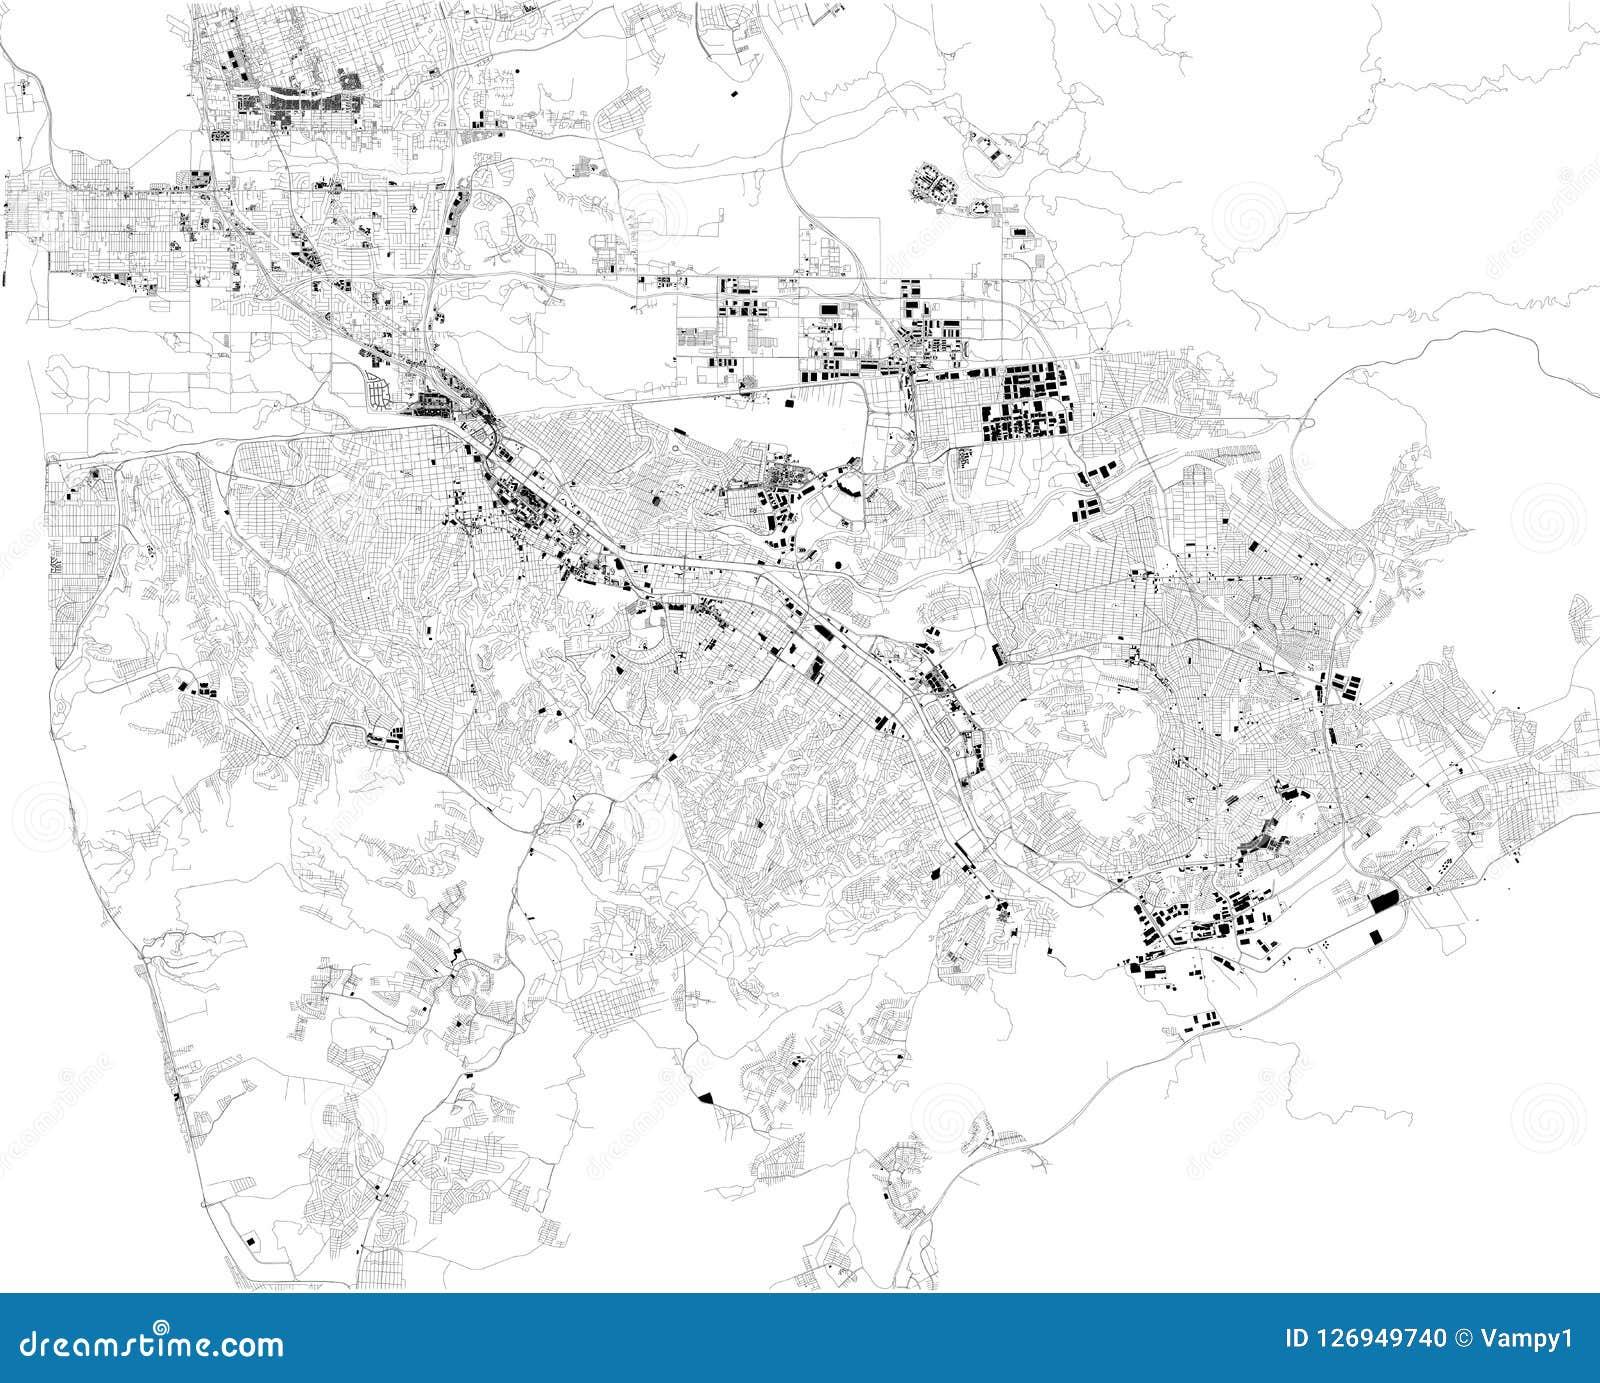 Map Of Tijuana, Satellite View, Black And White Map. Mexico ... California Satellite Map on